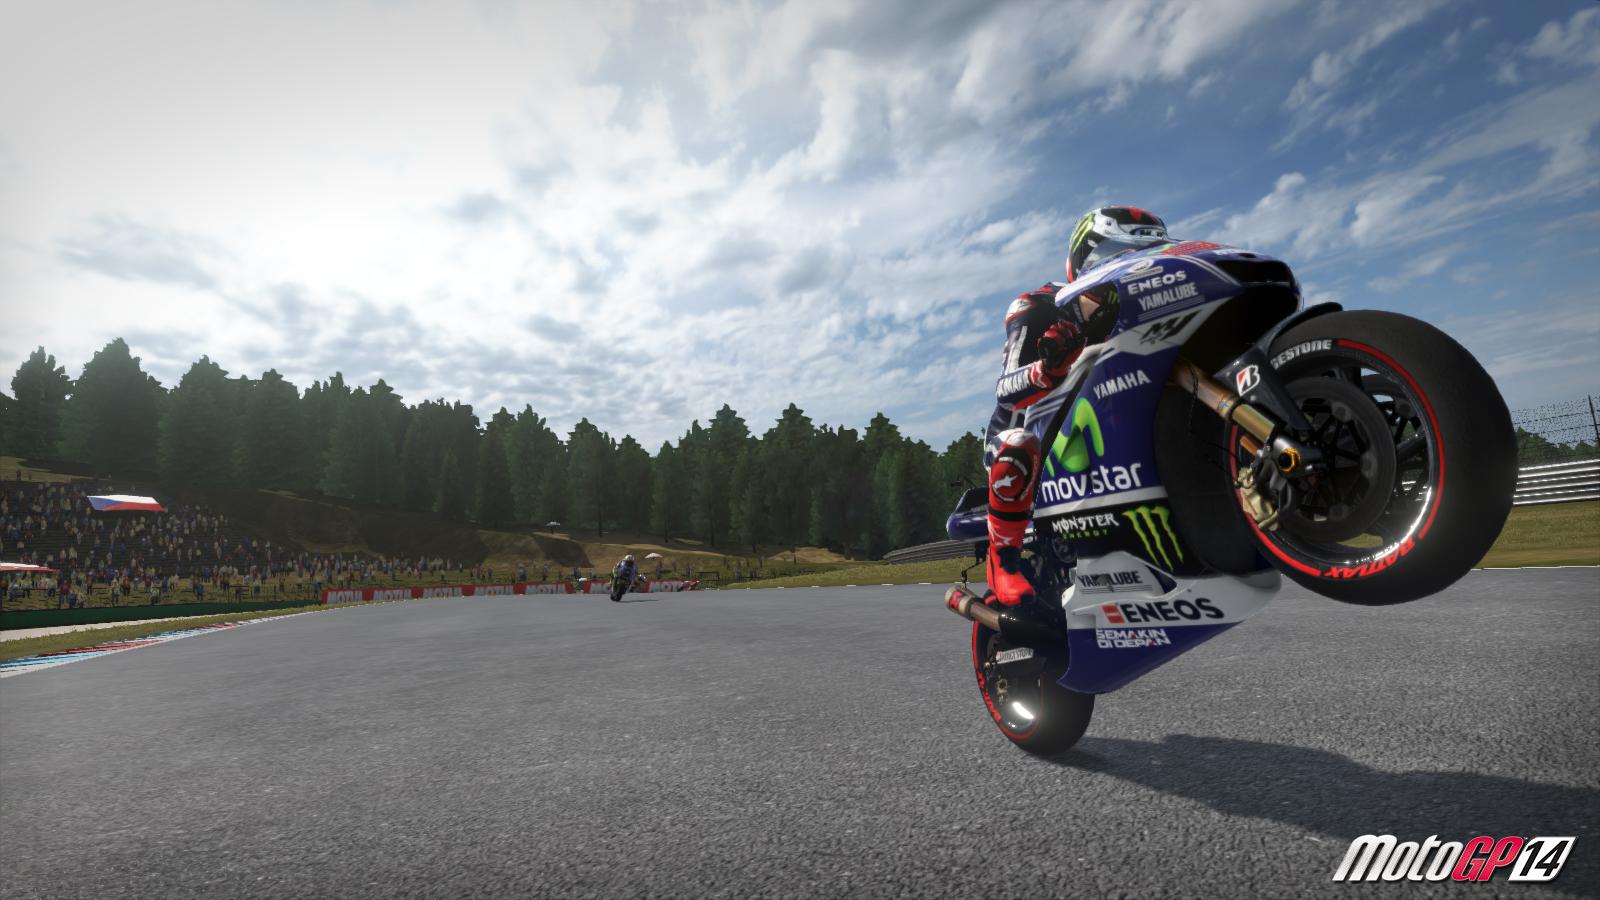 MotoGP 14 Multilenguaje ESPAÑOL XBOX 360 (Región NTSC-U/PAL) 4